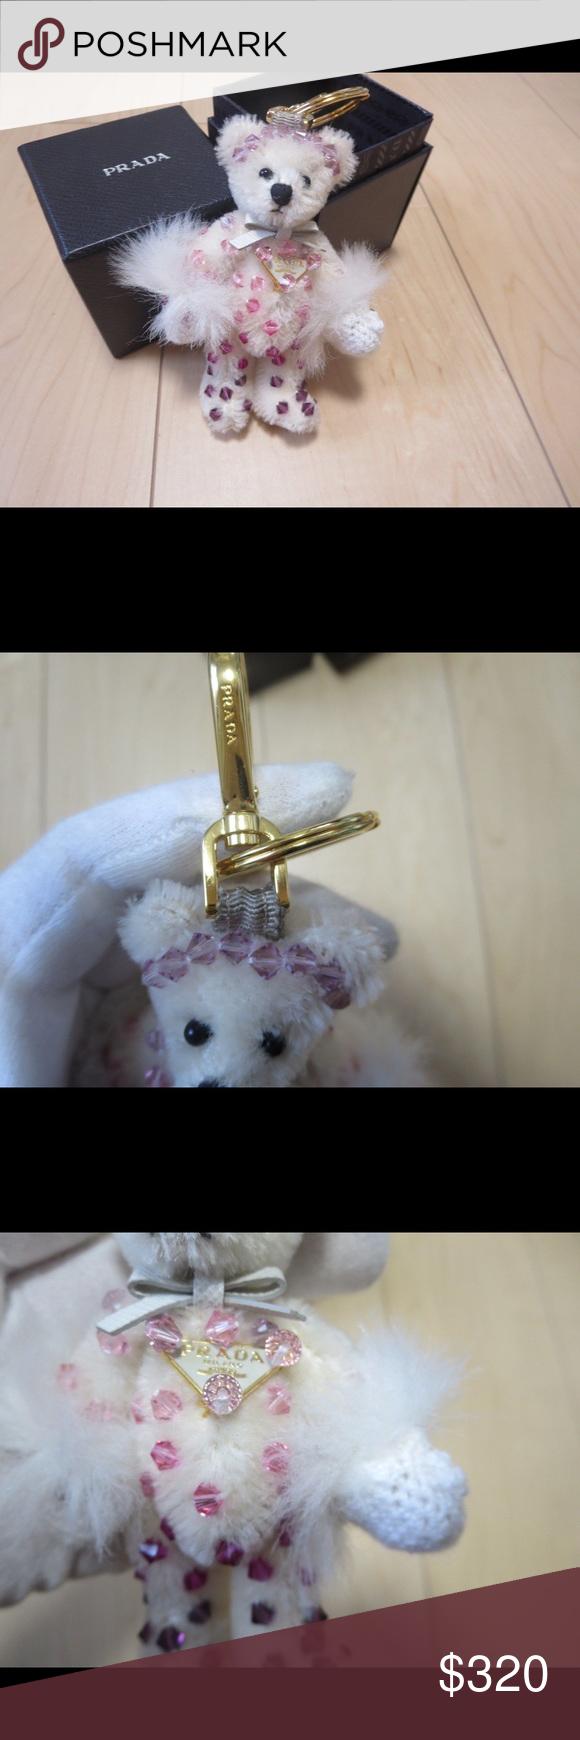 Prada bear keychain Comes with box Prada Accessories